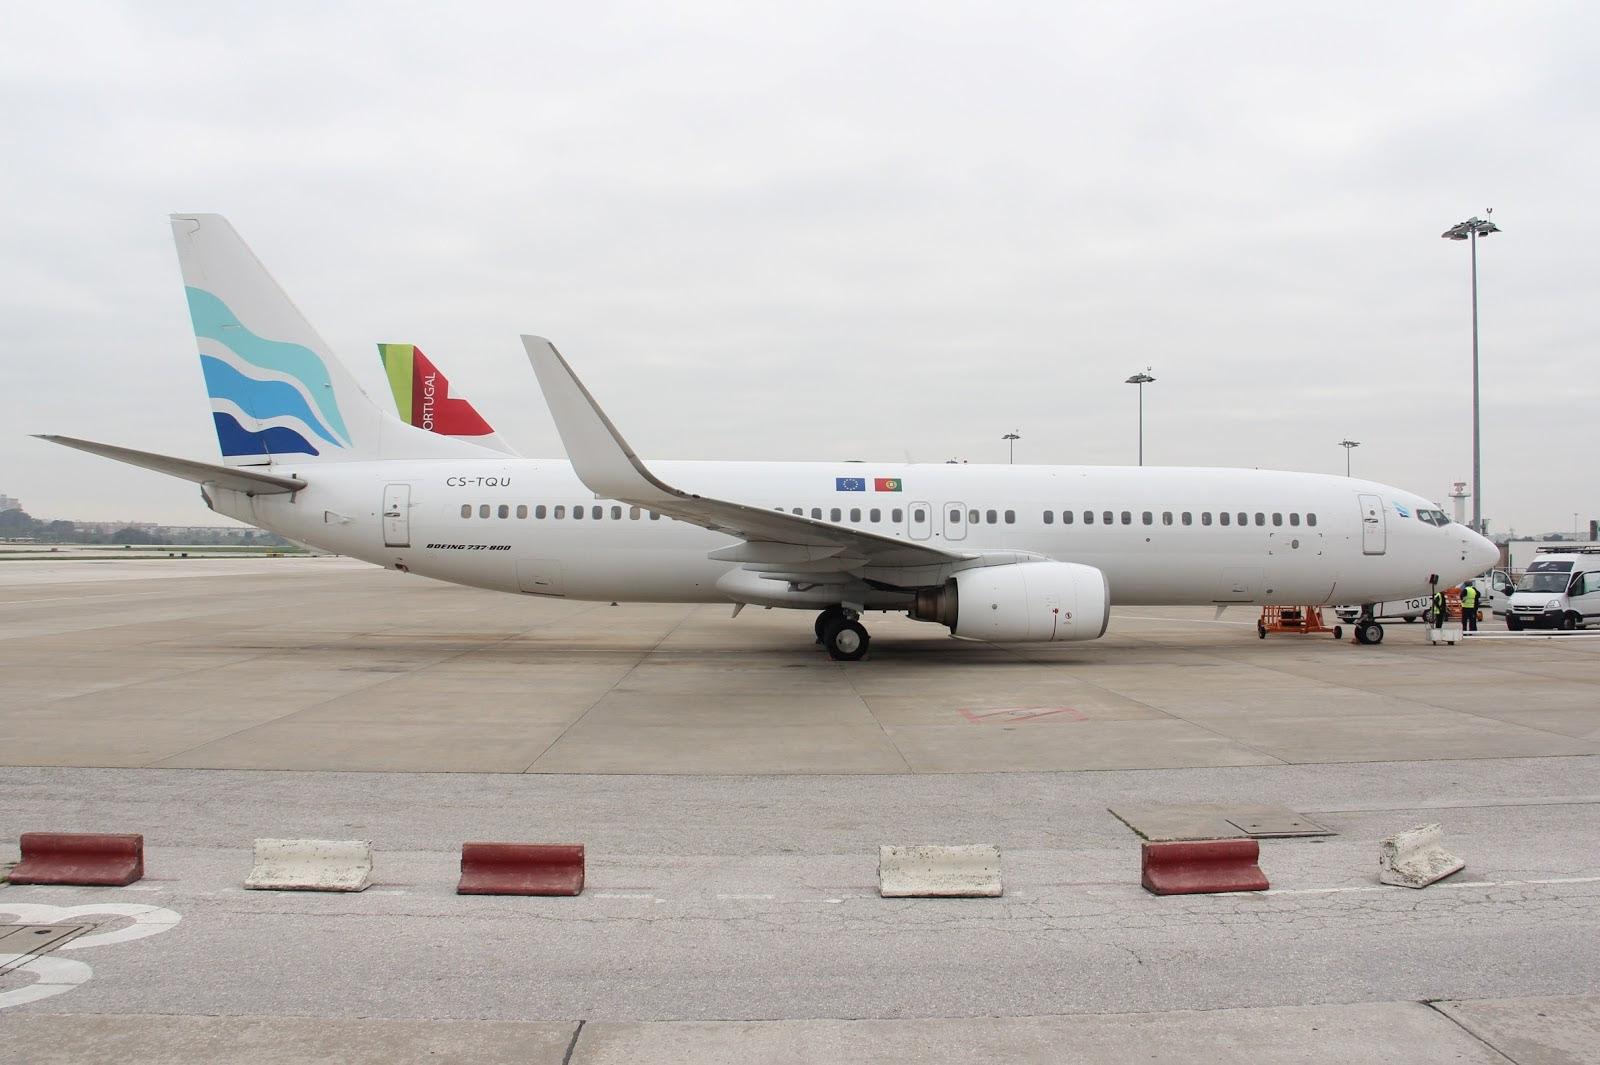 Med-View Airlines 737-800 CS-TQU